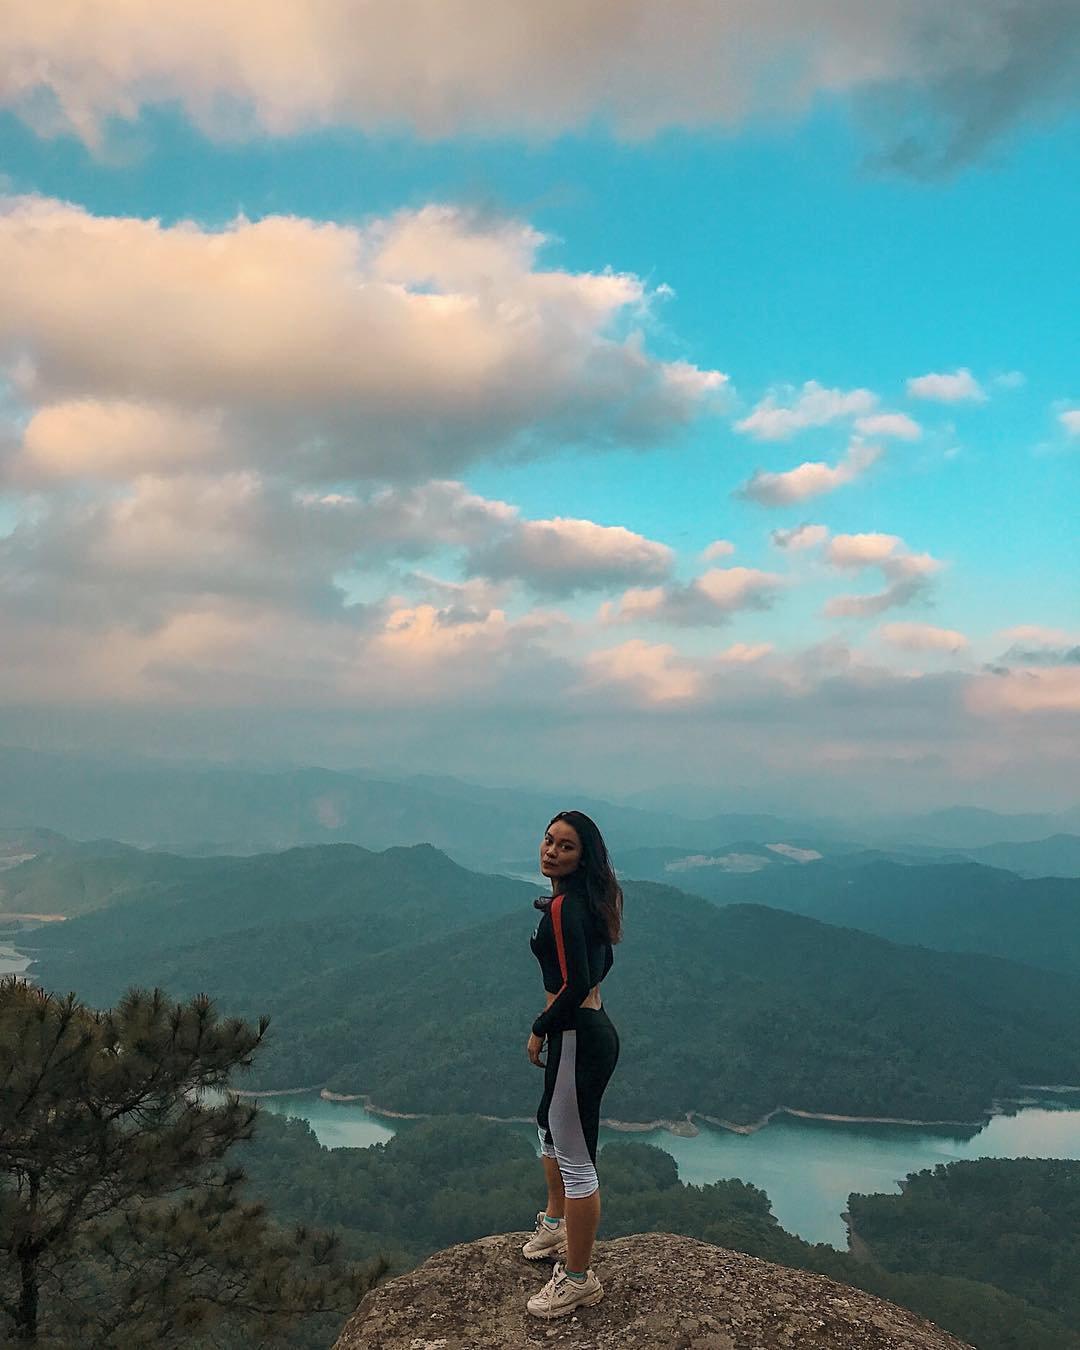 om-tim-hoc-kinh-nghiem-trekking-nui-da-chong-doc-nhat-viet-nam-ai-cung-muon-thu-27